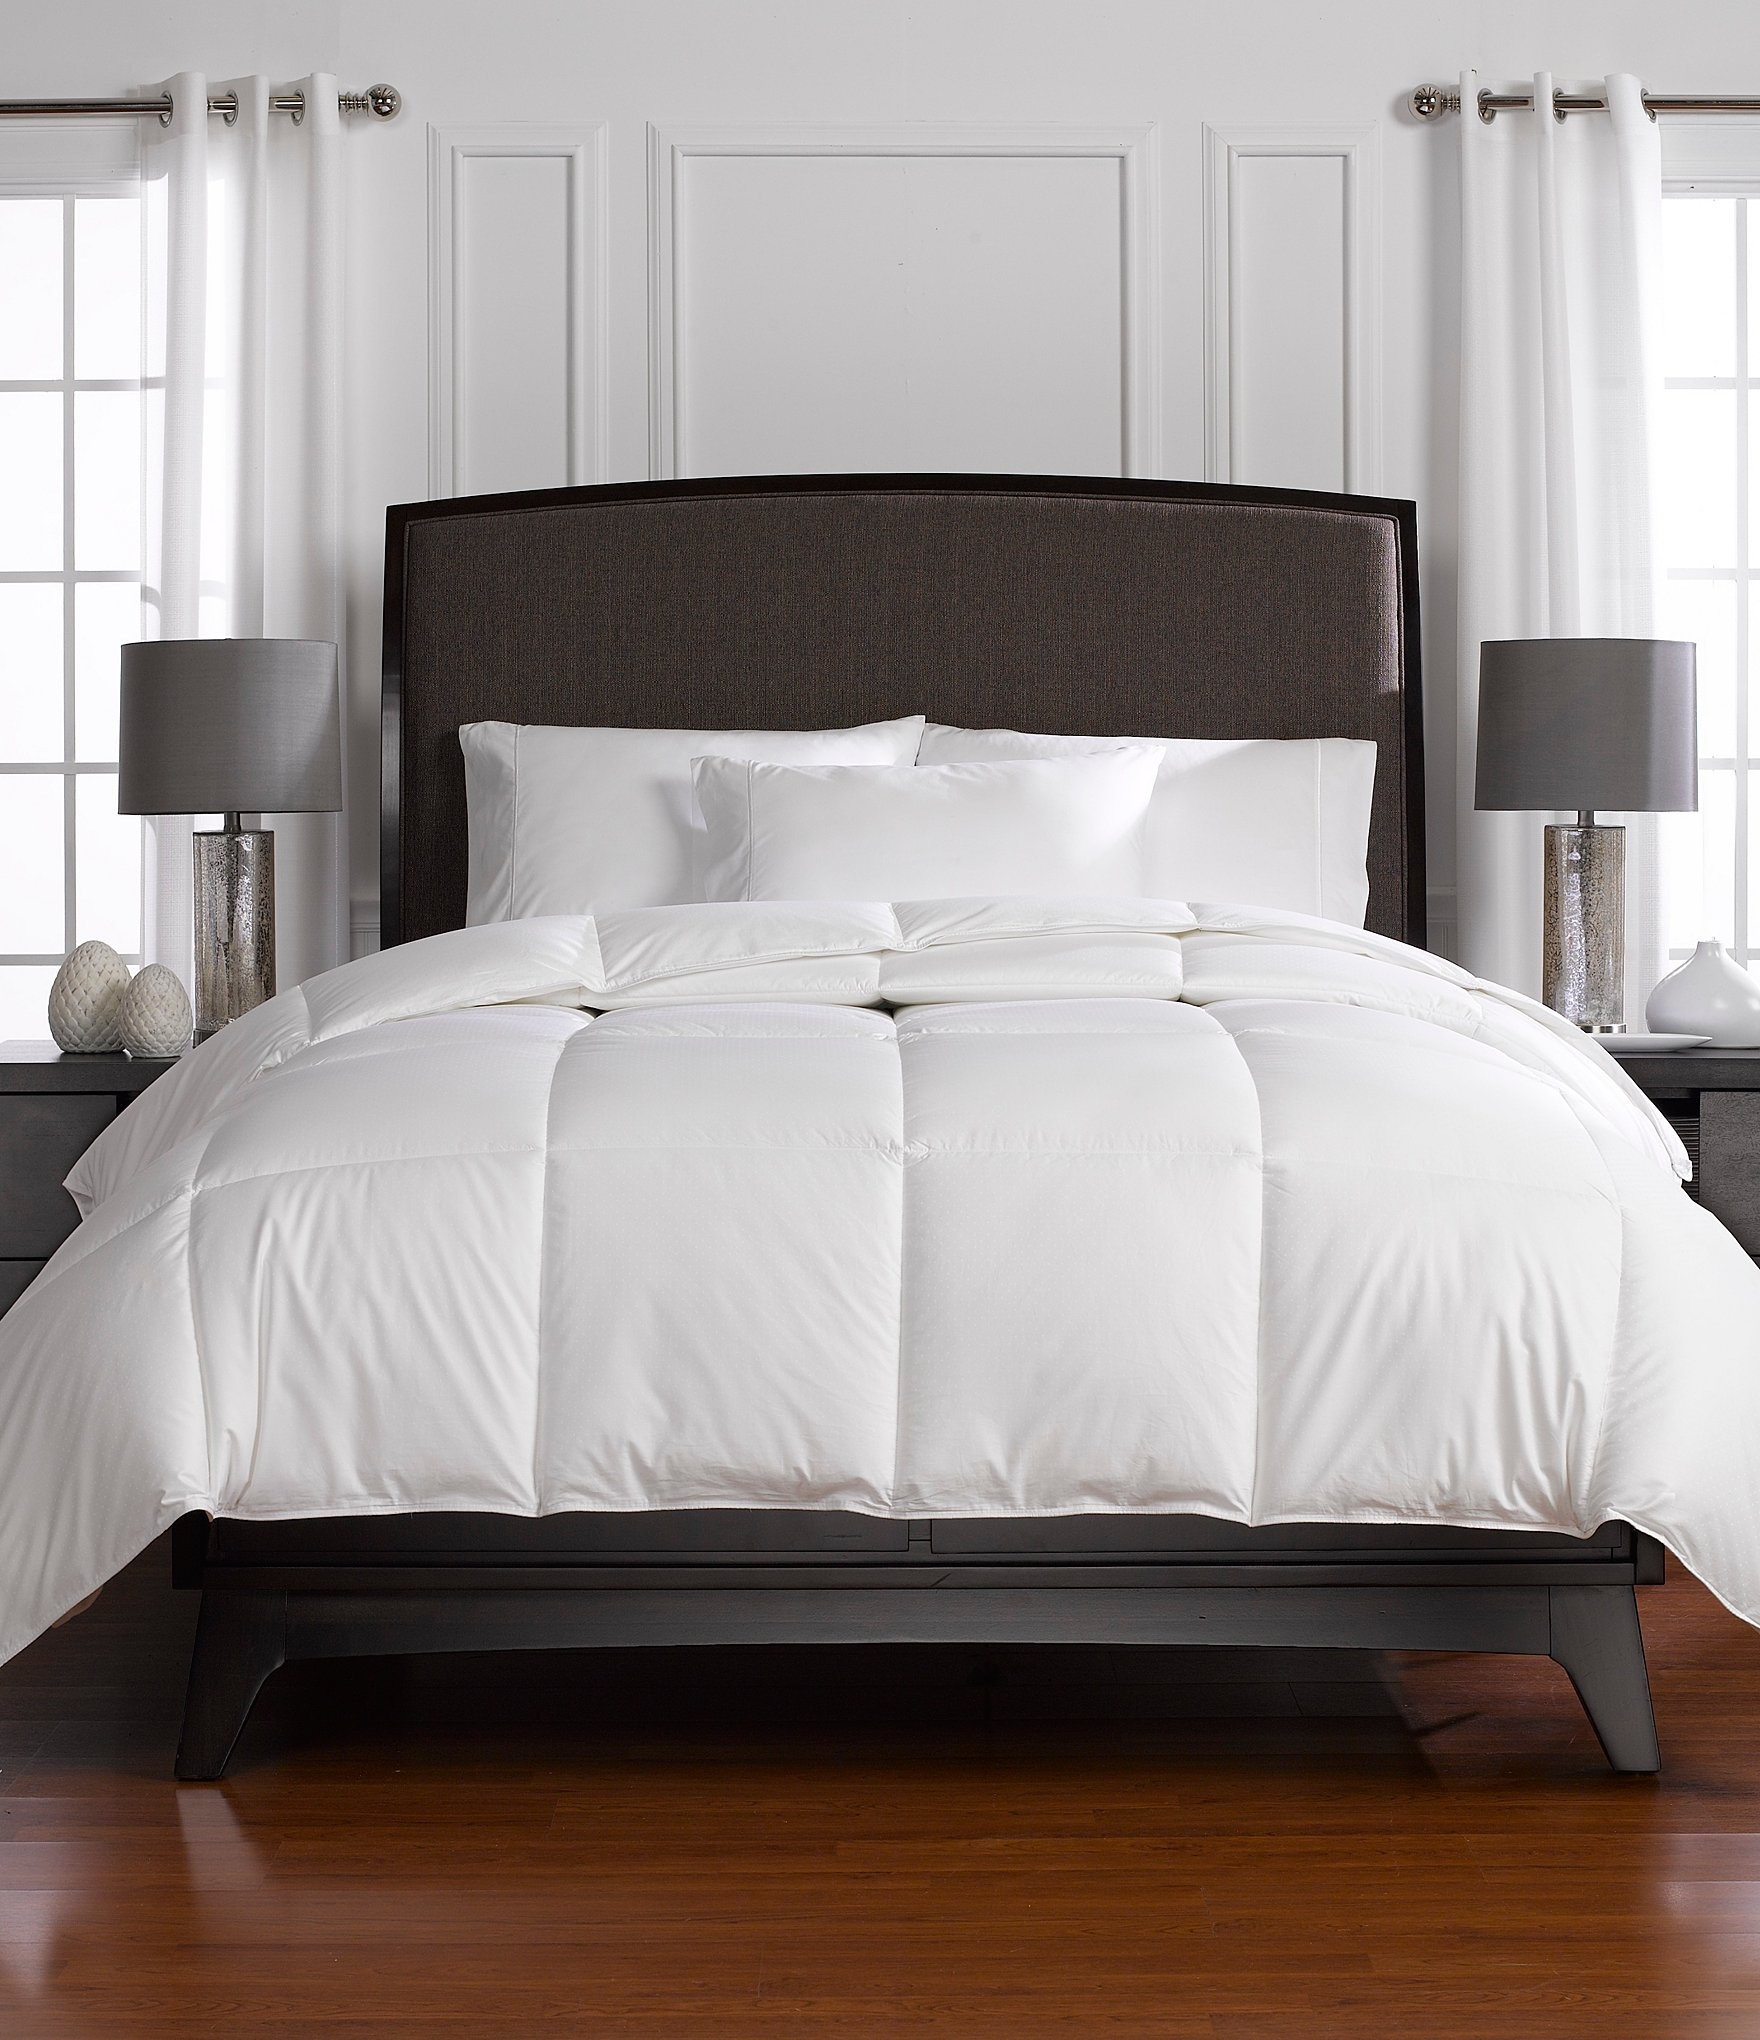 Southern Living Year Round Warmth Comforter Duvet Insert